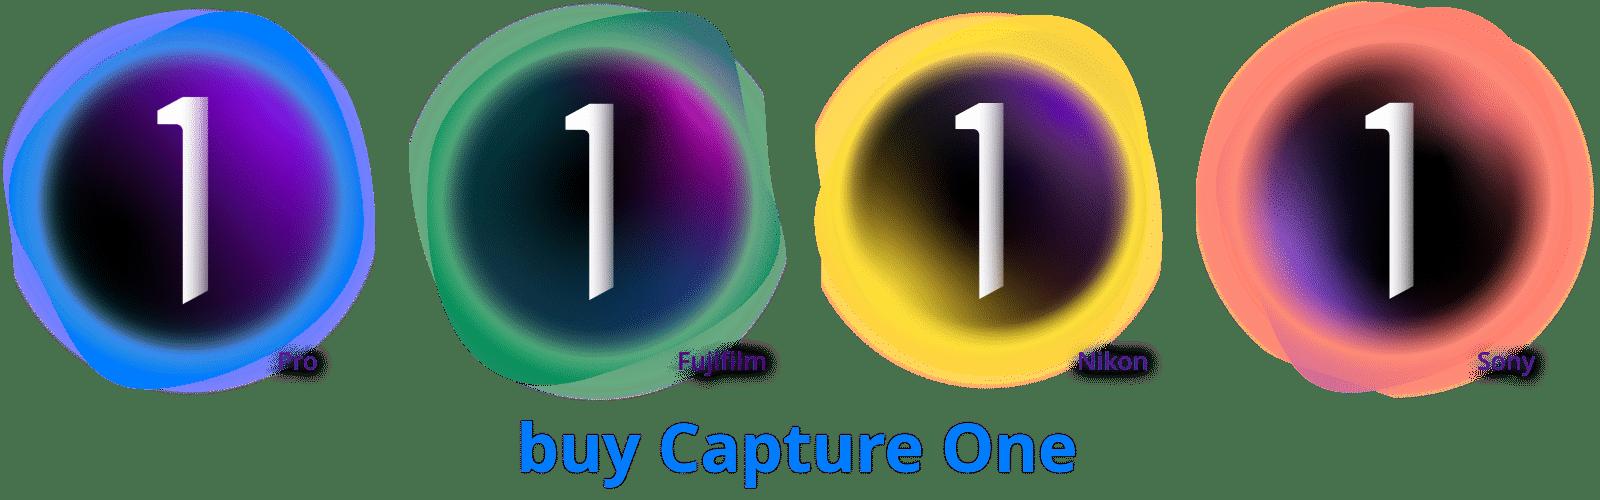 buy capture one banner